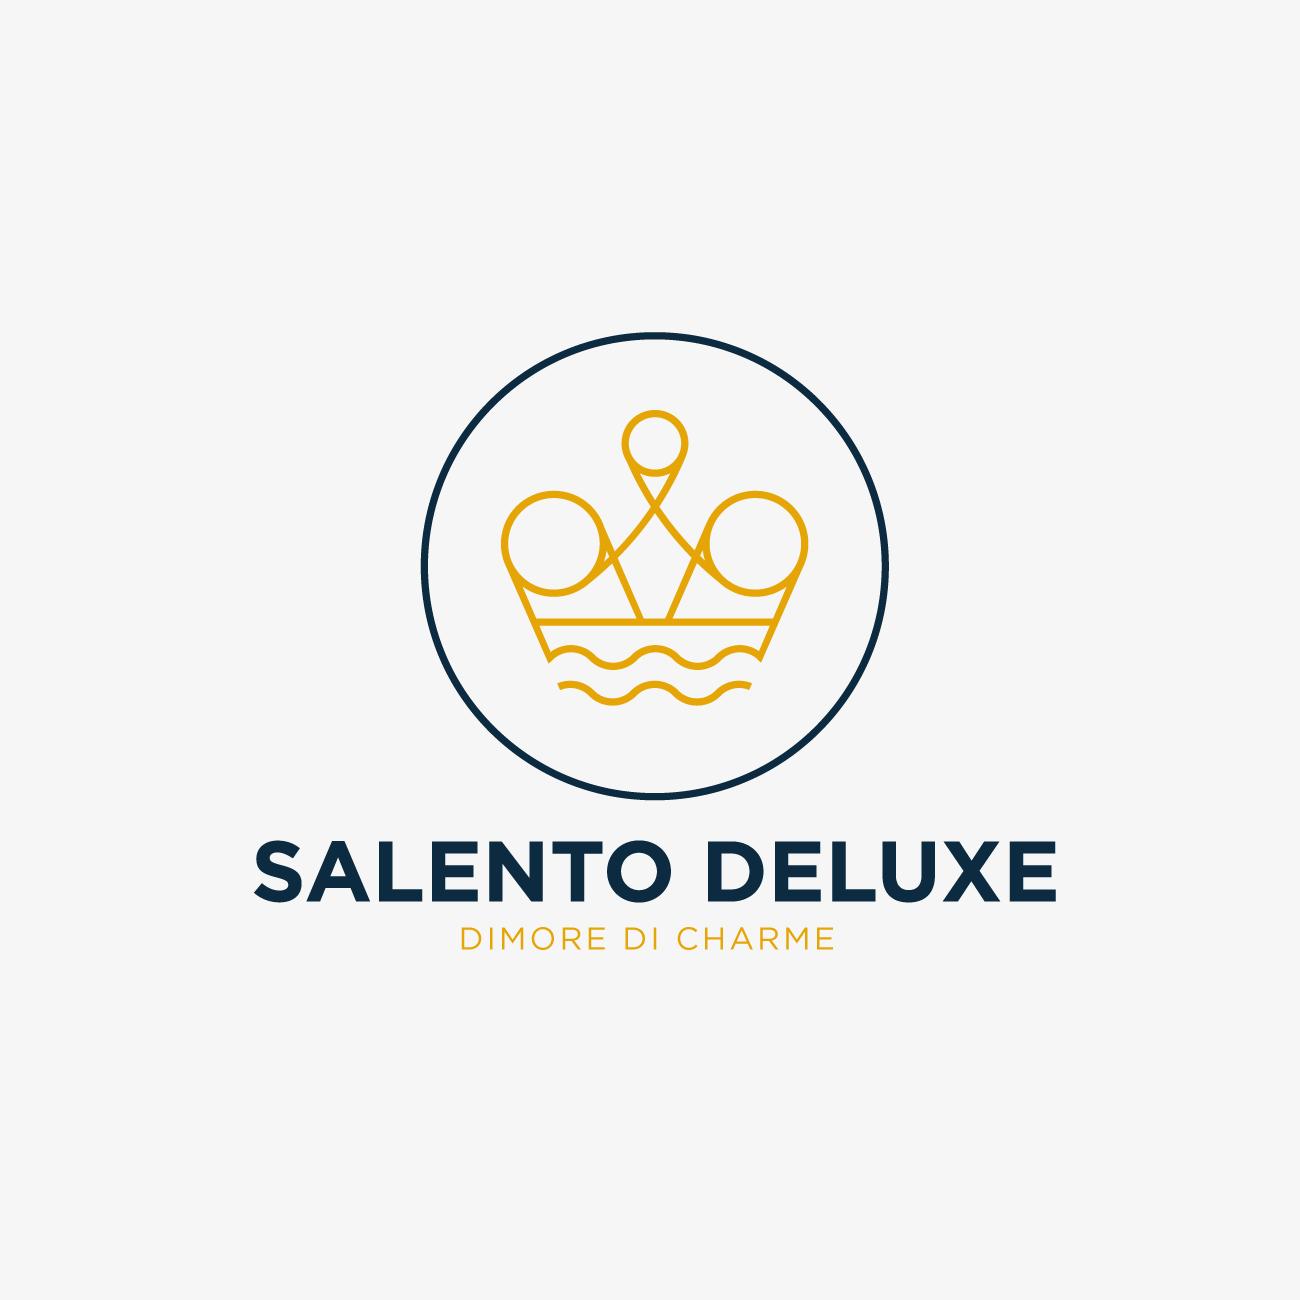 https://www.orlandinifrancesco.com/wp/wp-content/uploads/2019/02/Salento-Deluxe-Logo5.png